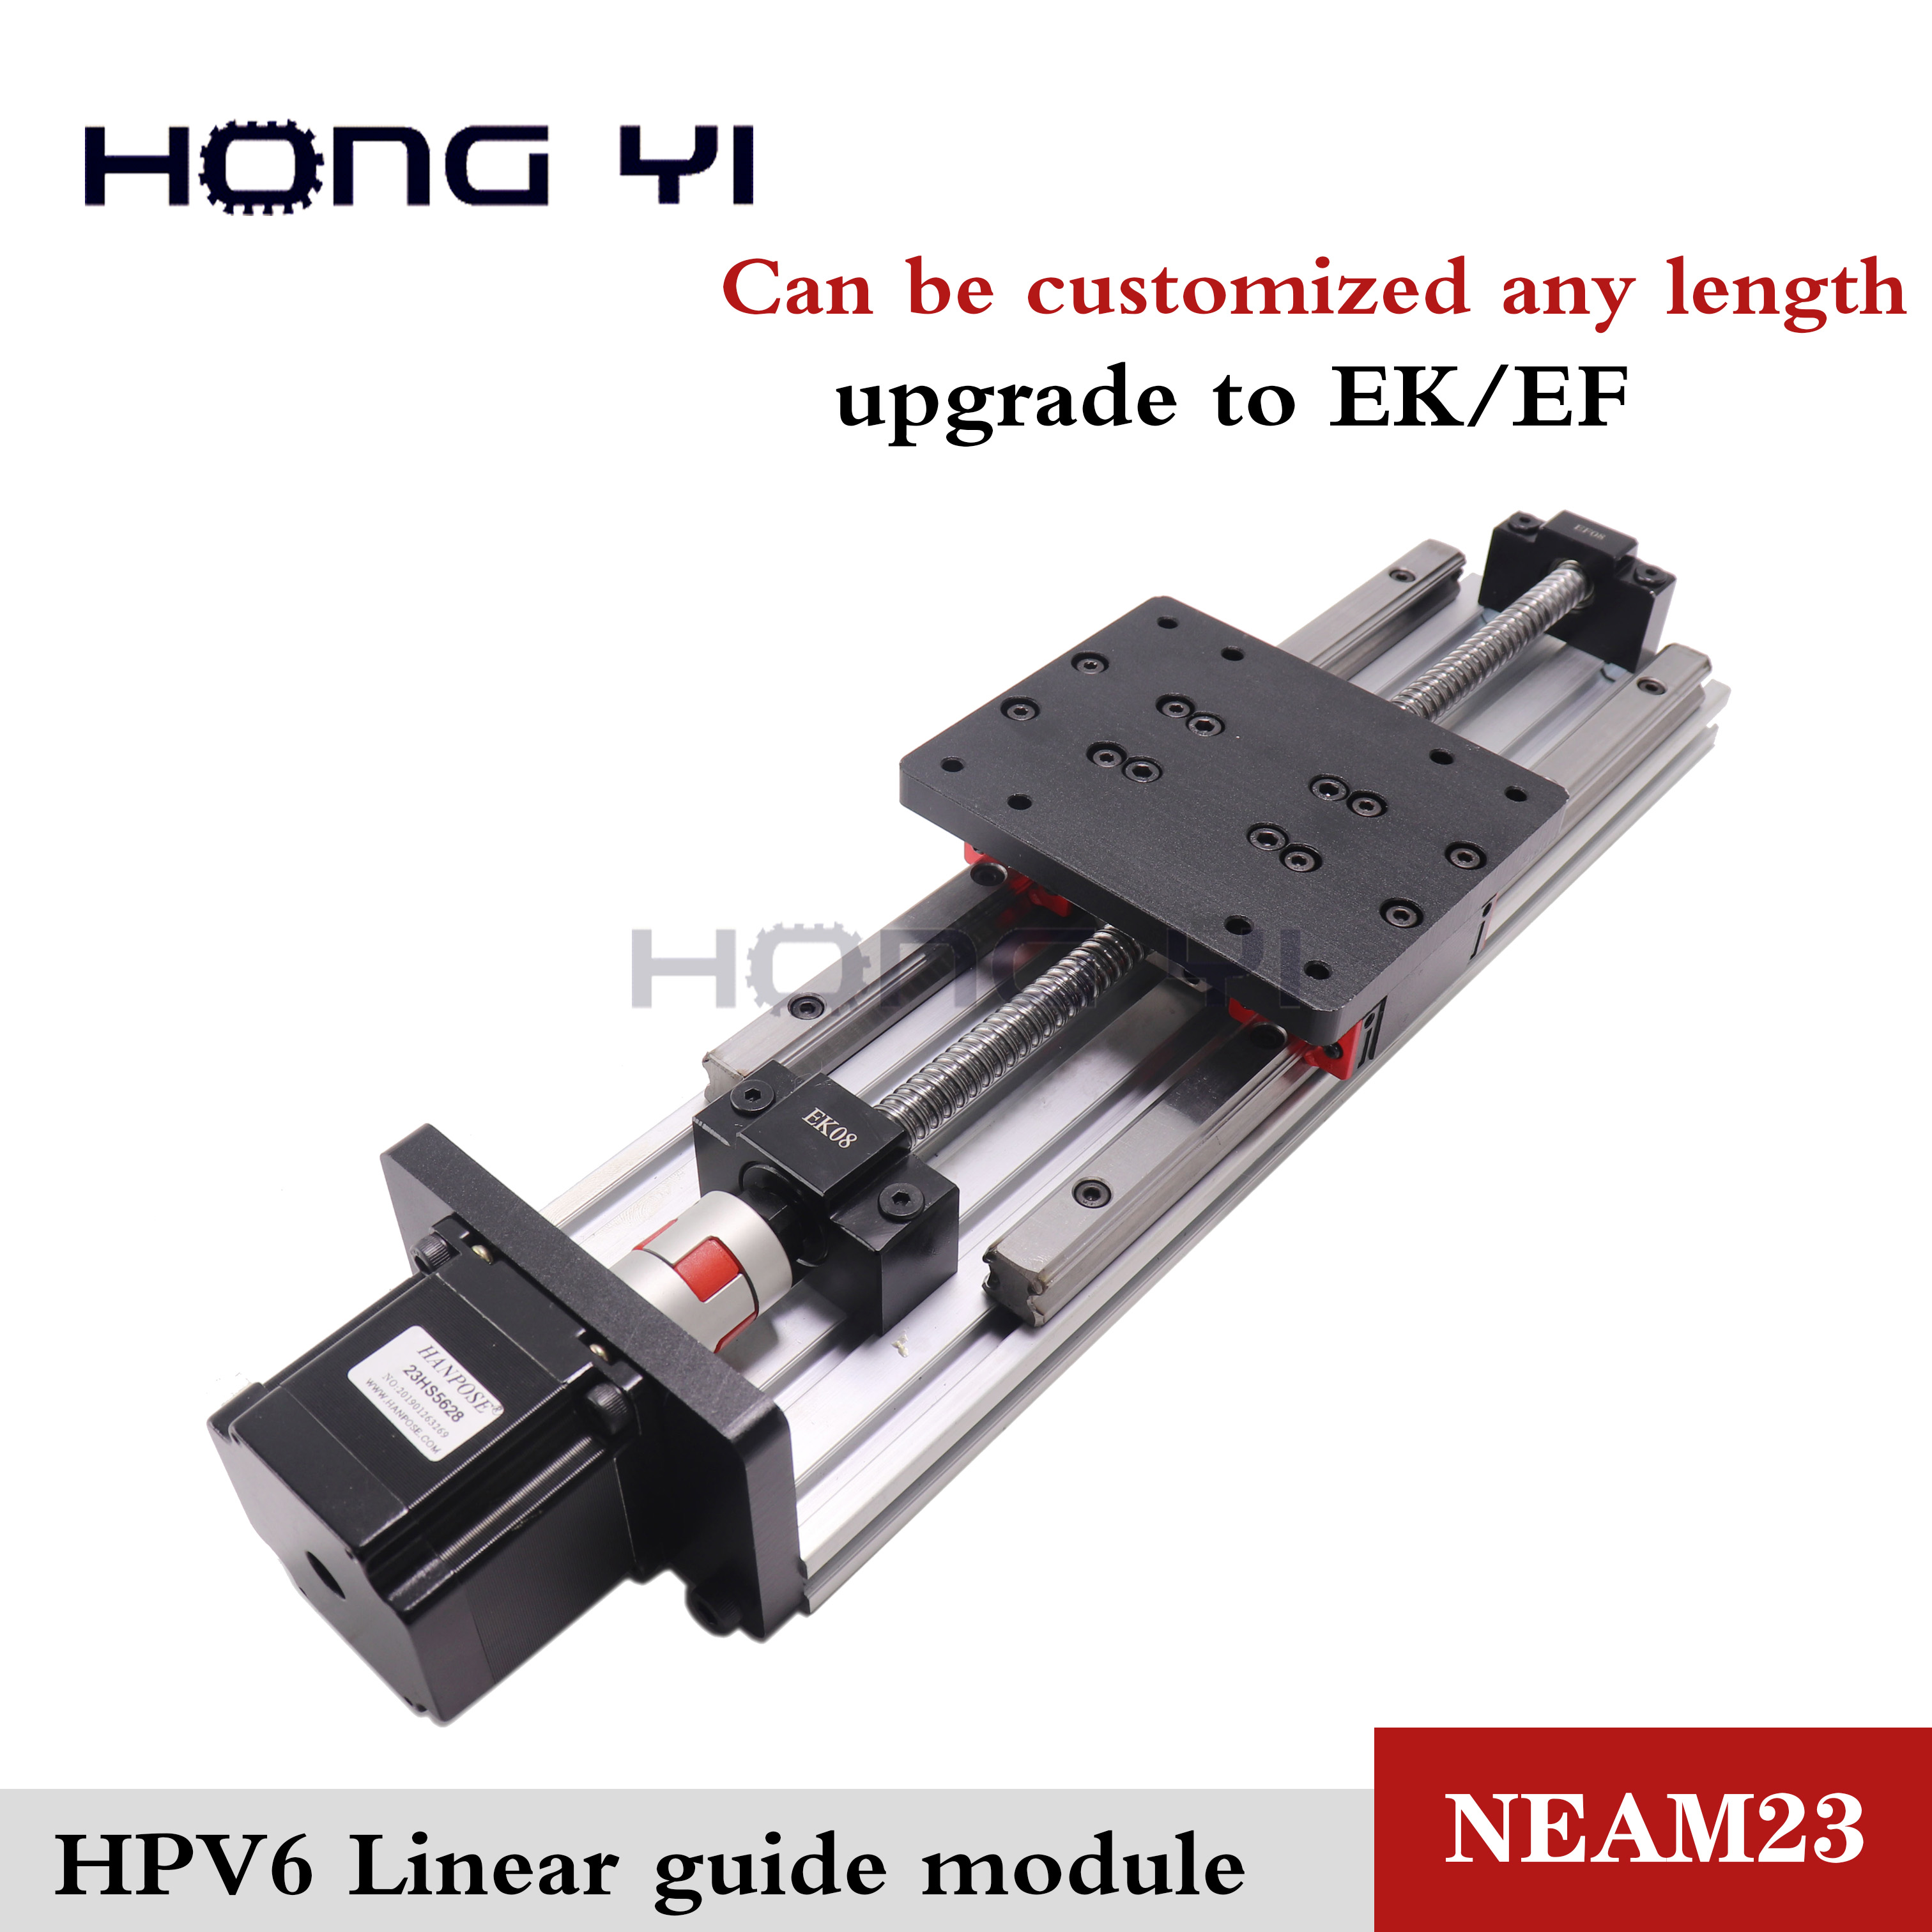 HPV6 Linear module ballscrew sfu1204 with Linear Guides HGR15 HIWIN 100% same size with NEMA23 2.8A 56mm stepper motor